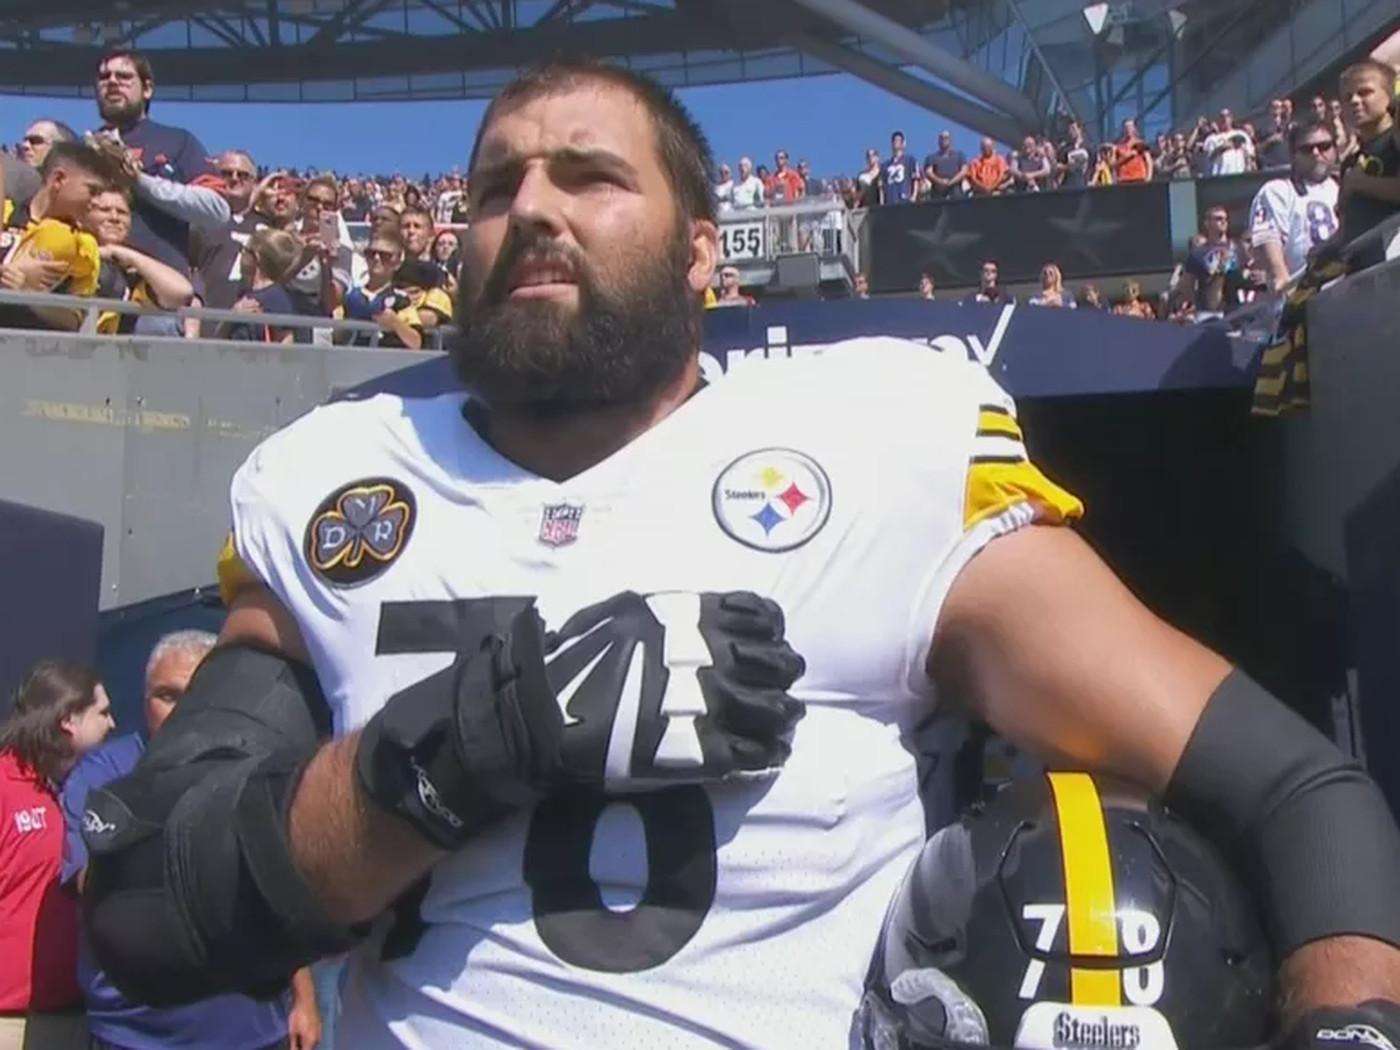 38ba80ce9de Steelers  Alejandro Villanueva  embarrassed  by national anthem photo -  SBNation.com